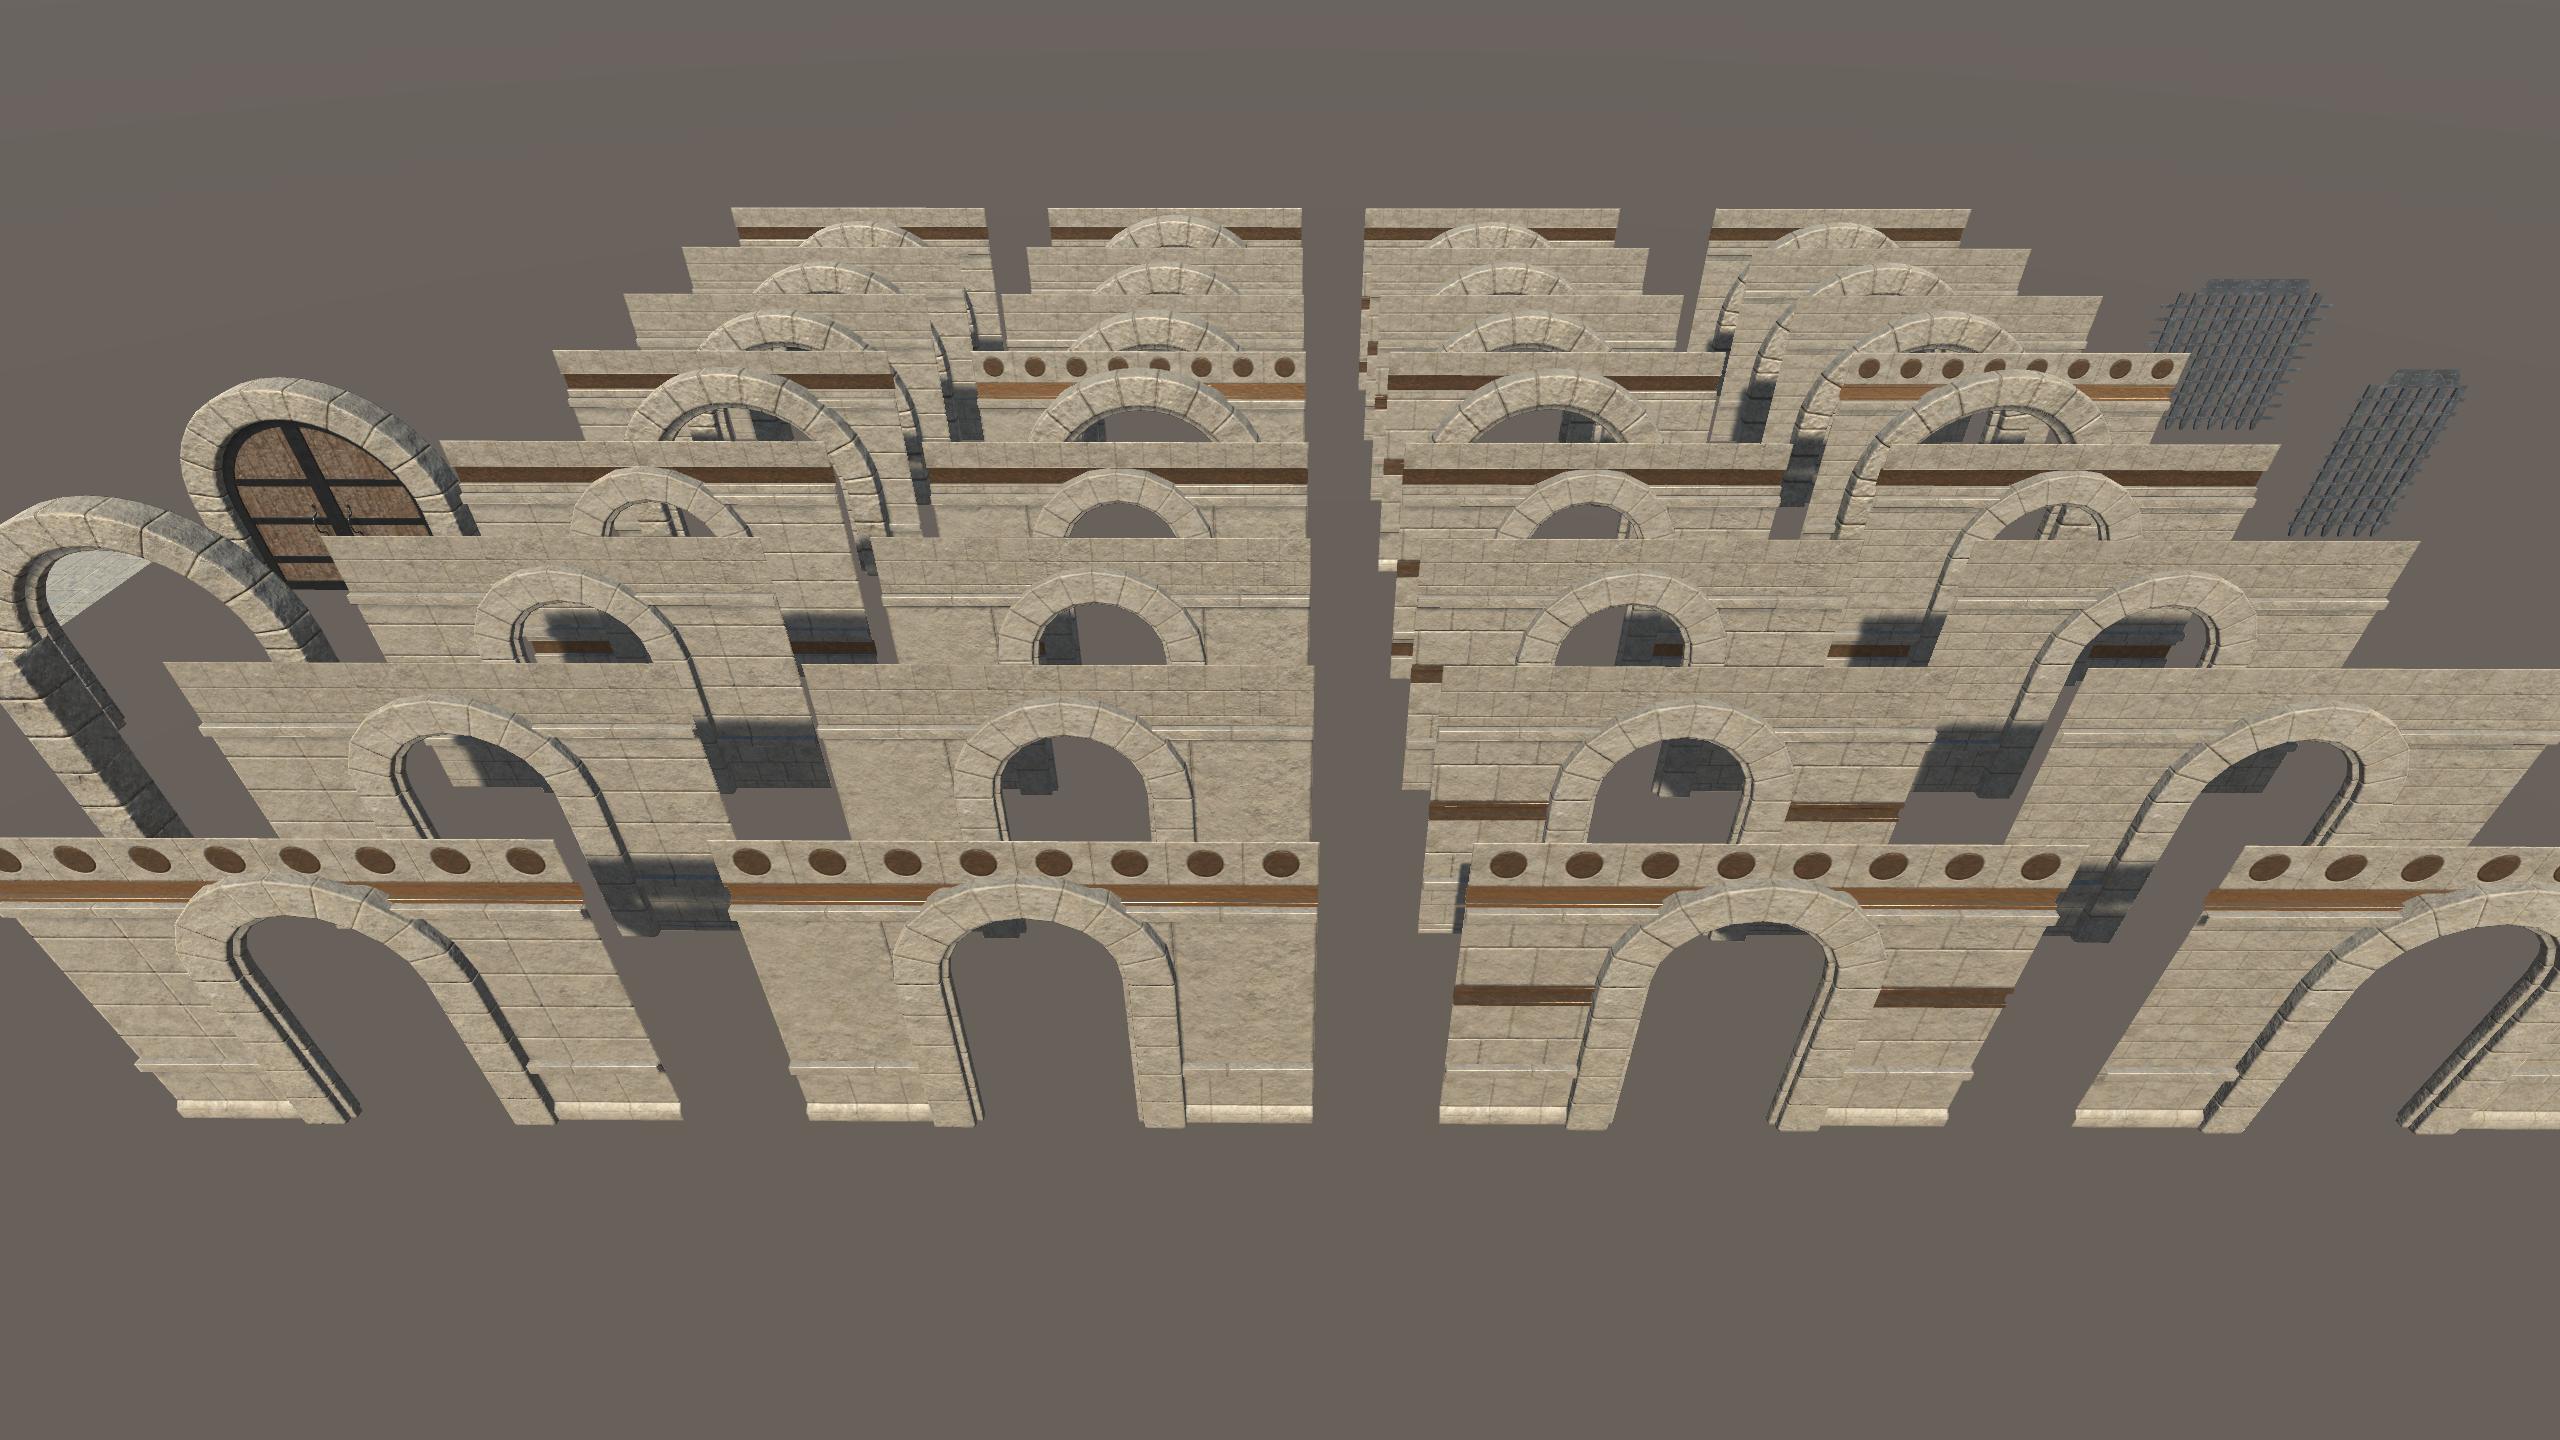 Infi-Dungeon v1.0, Walls